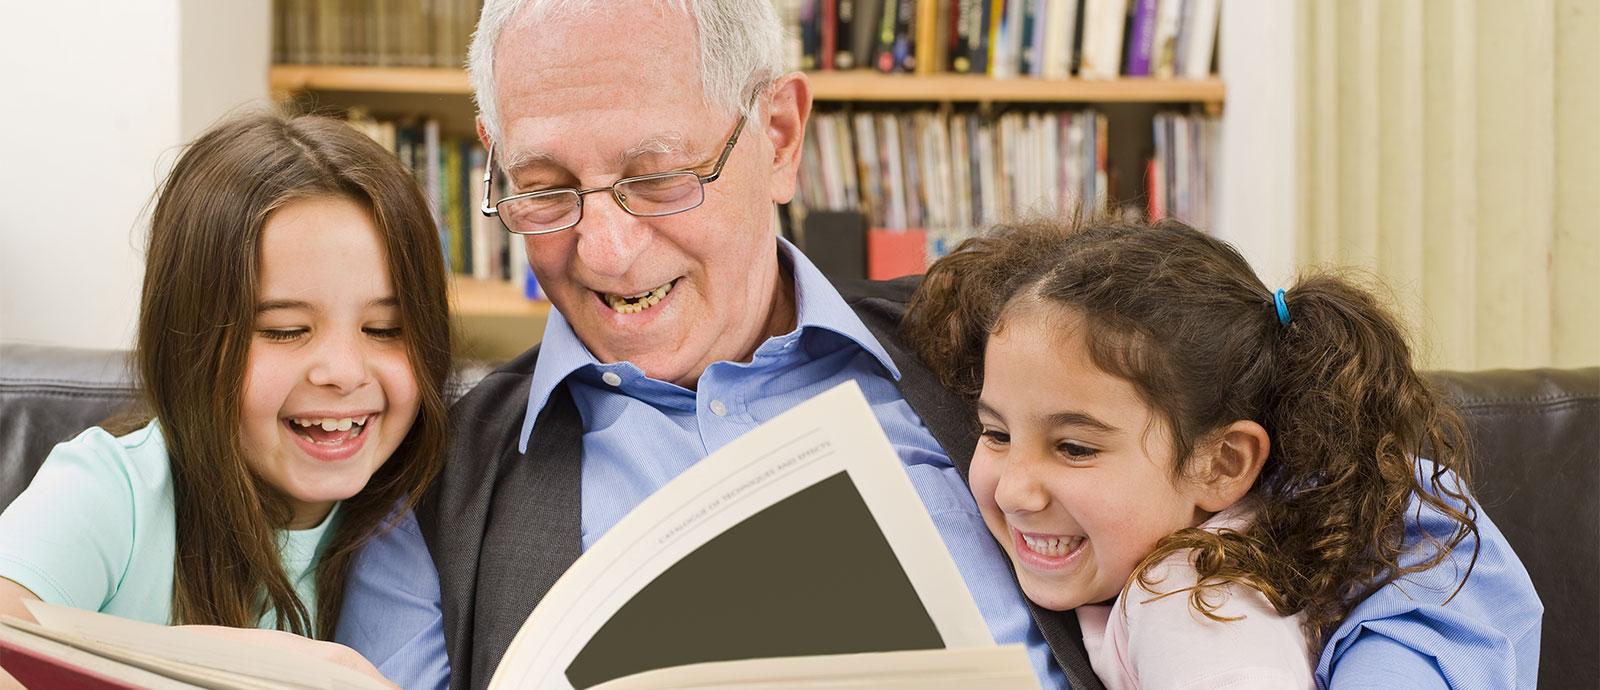 grandpa-reading-to-kids-intergeneration-ti